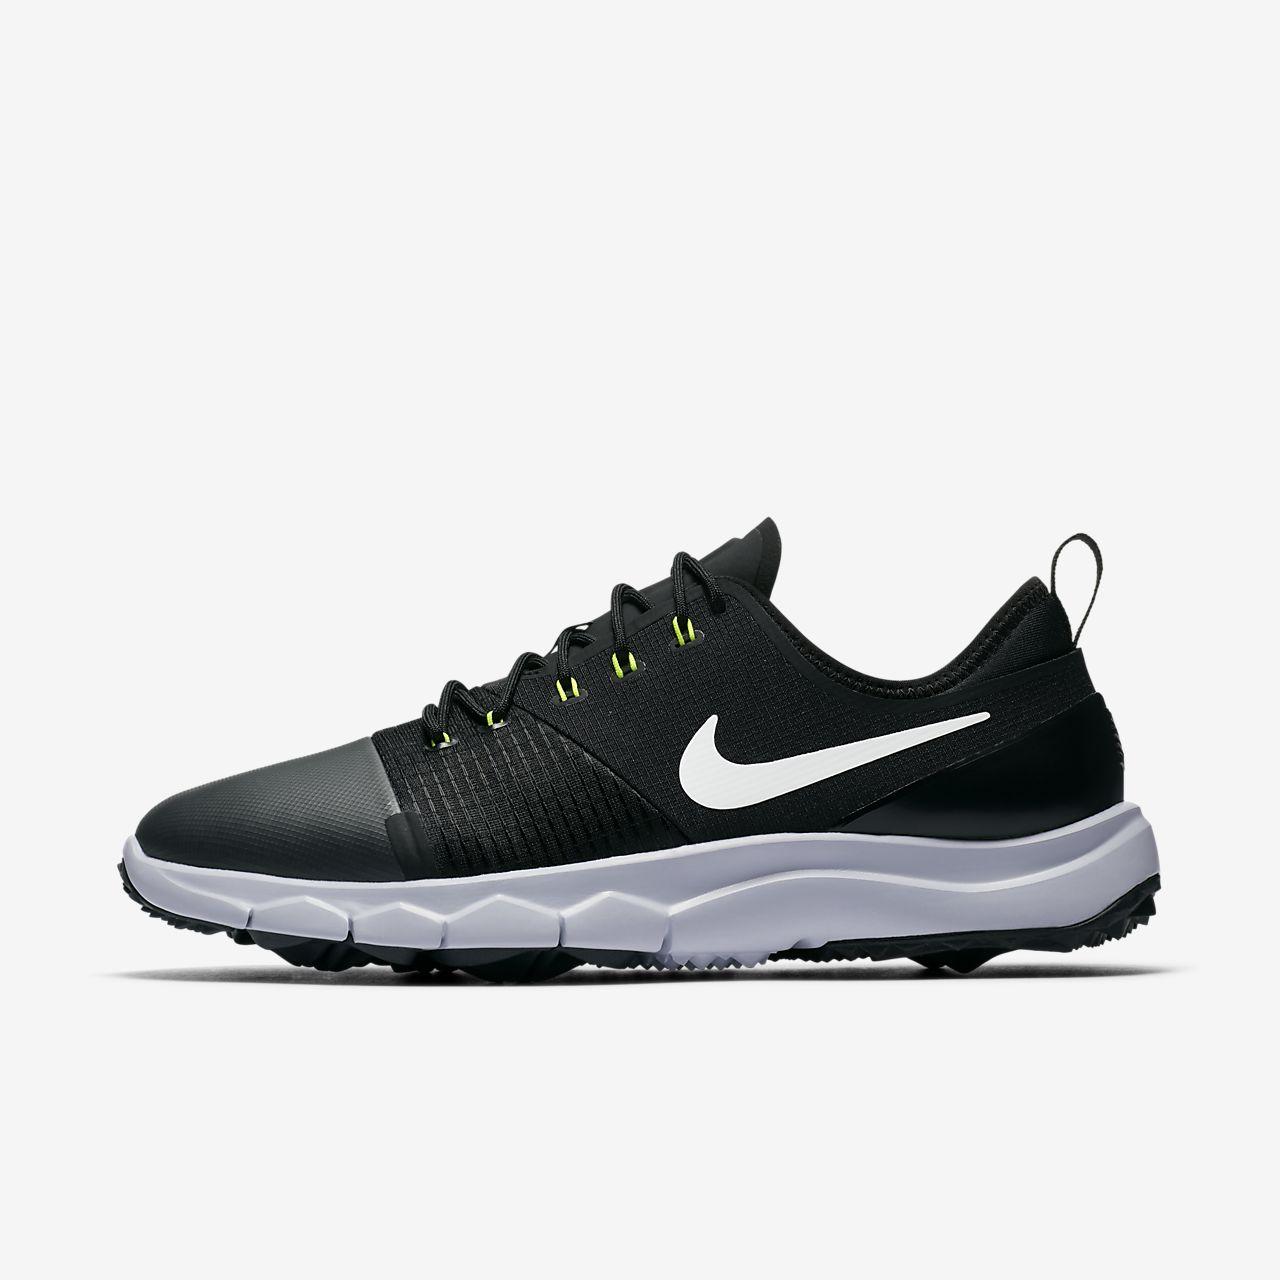 Nike FI Impact 3 Zapatillas de golf - Mujer